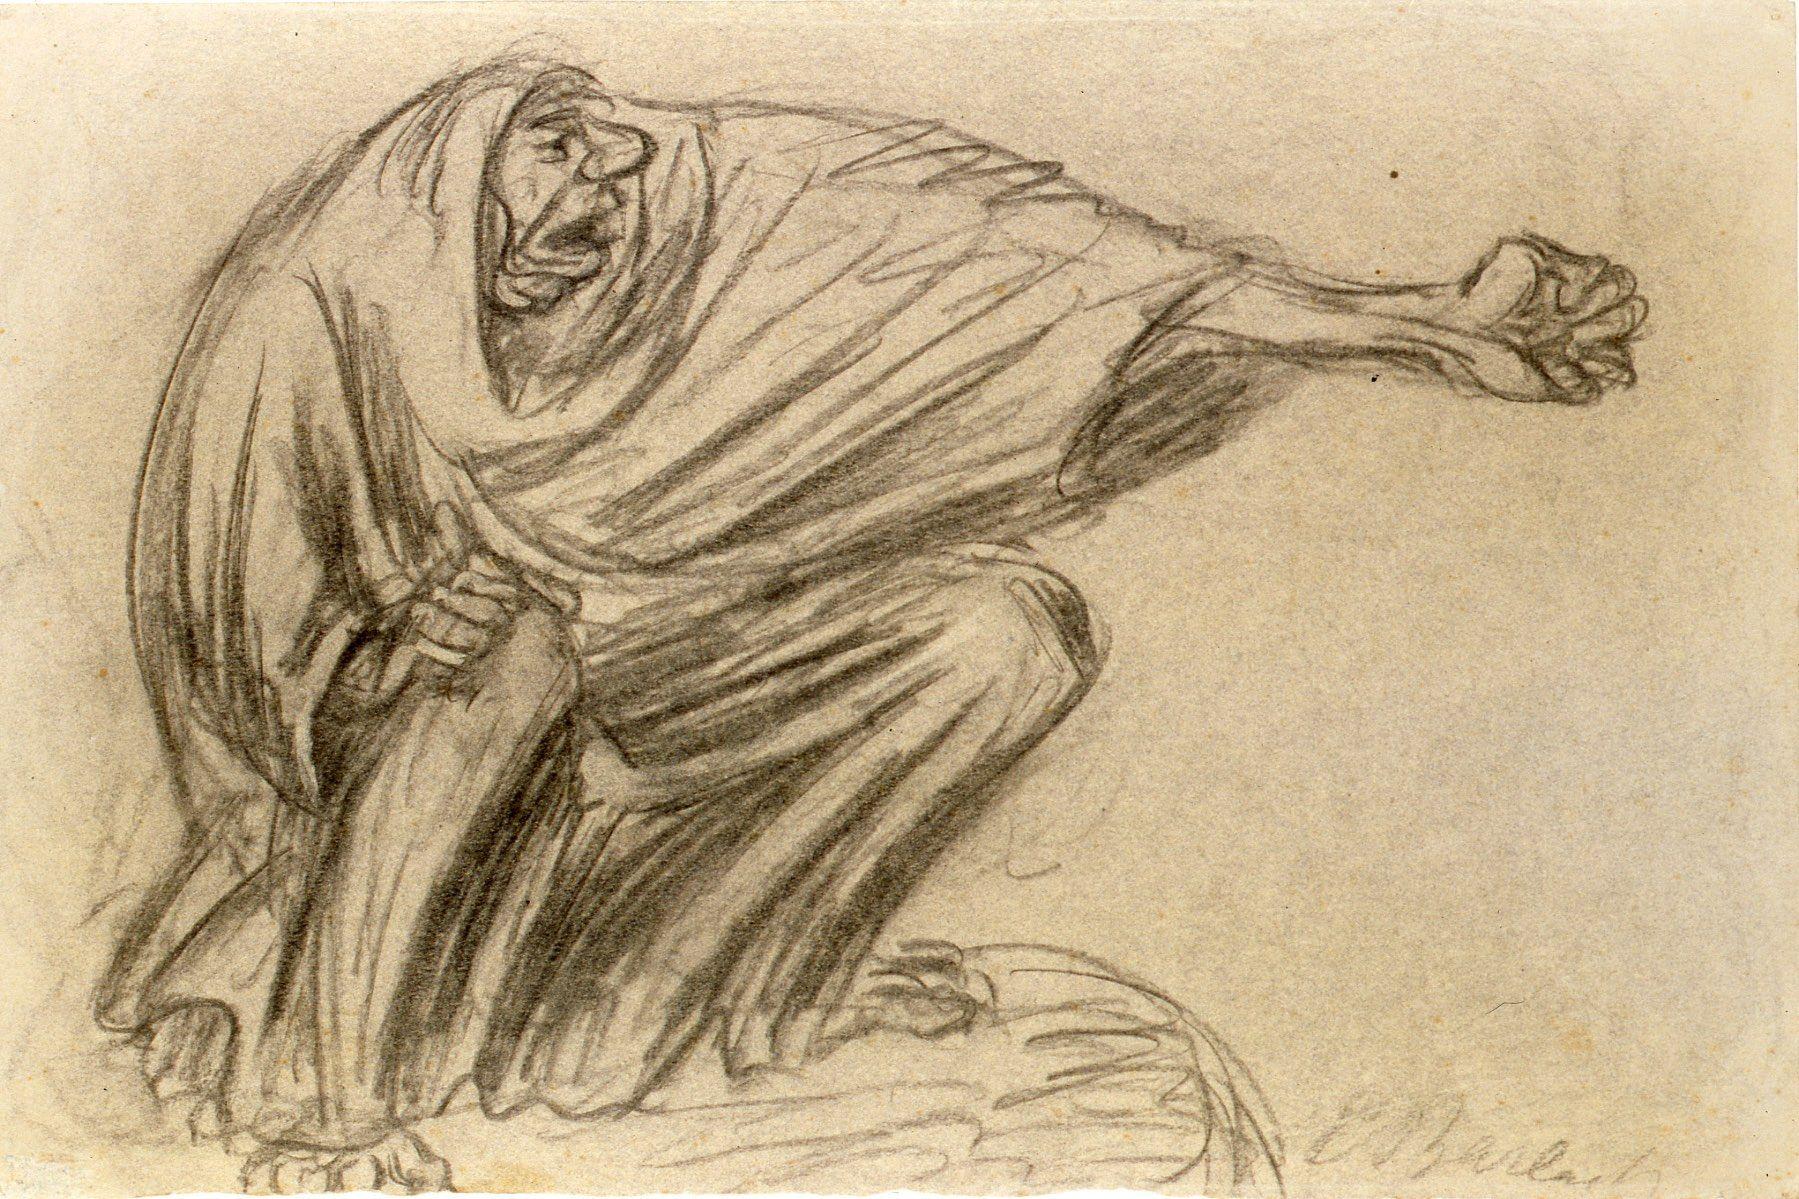 Mujer que maldice. Carboncillo. 1927. 32 x 47,8 cm. Artista Ernst Barlach.